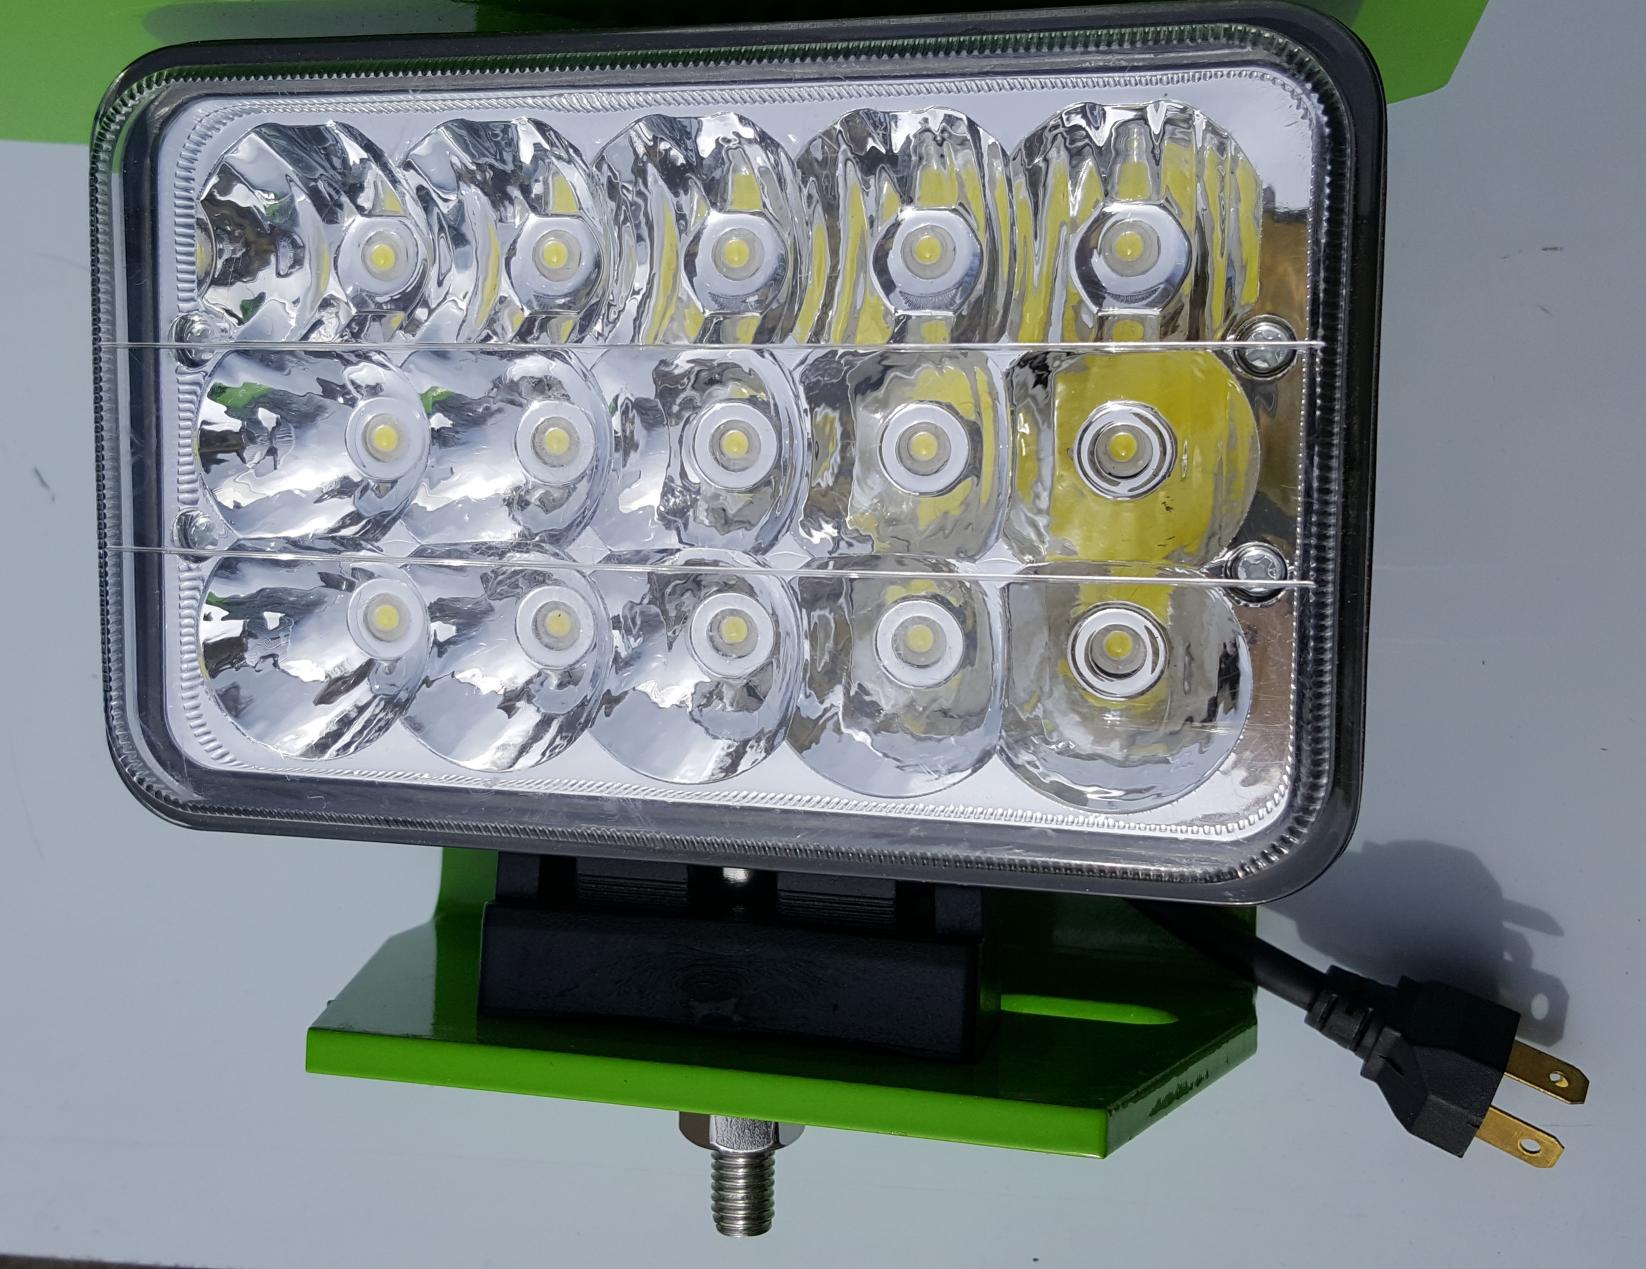 Deco Tractor Headlights : Tractor telehandler led headlight